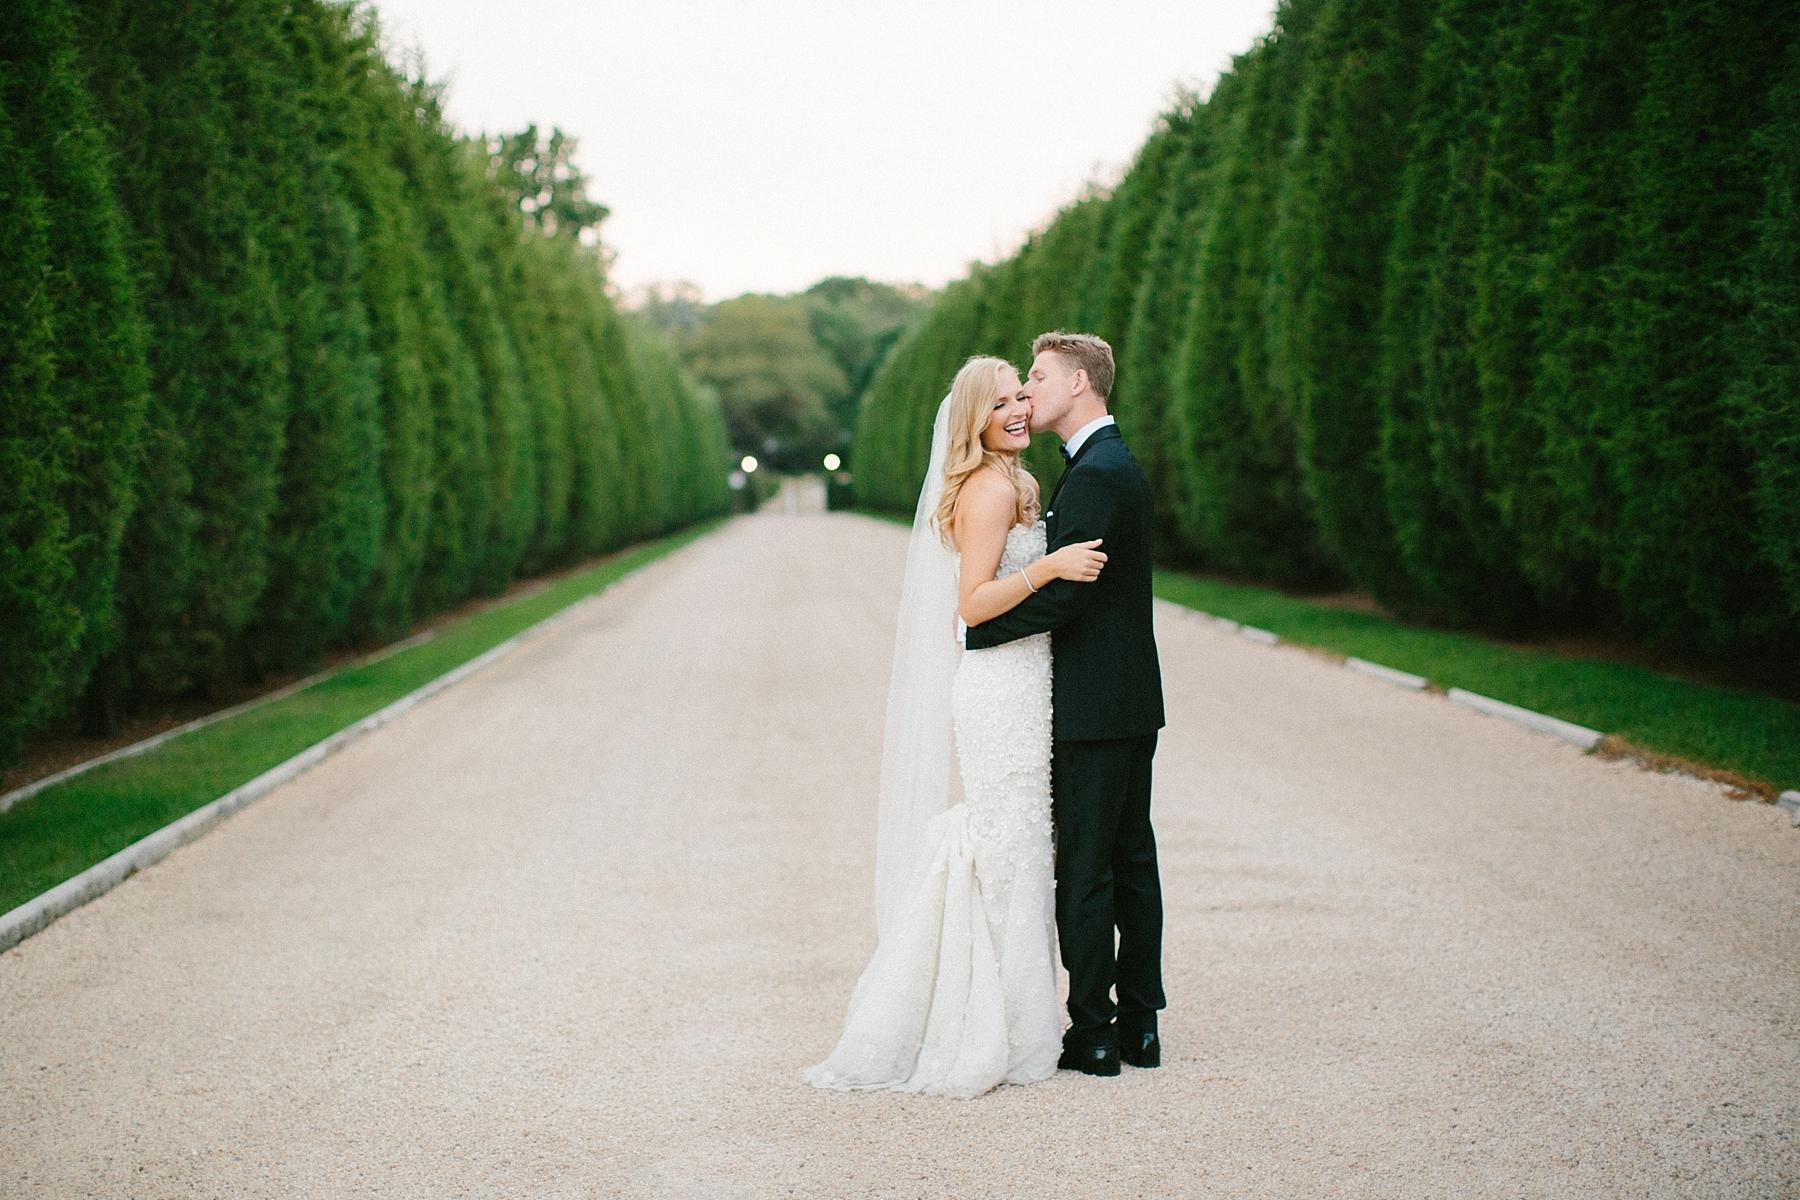 oheka-castle-wedding-nyc-photographer-long-island_0044.jpg